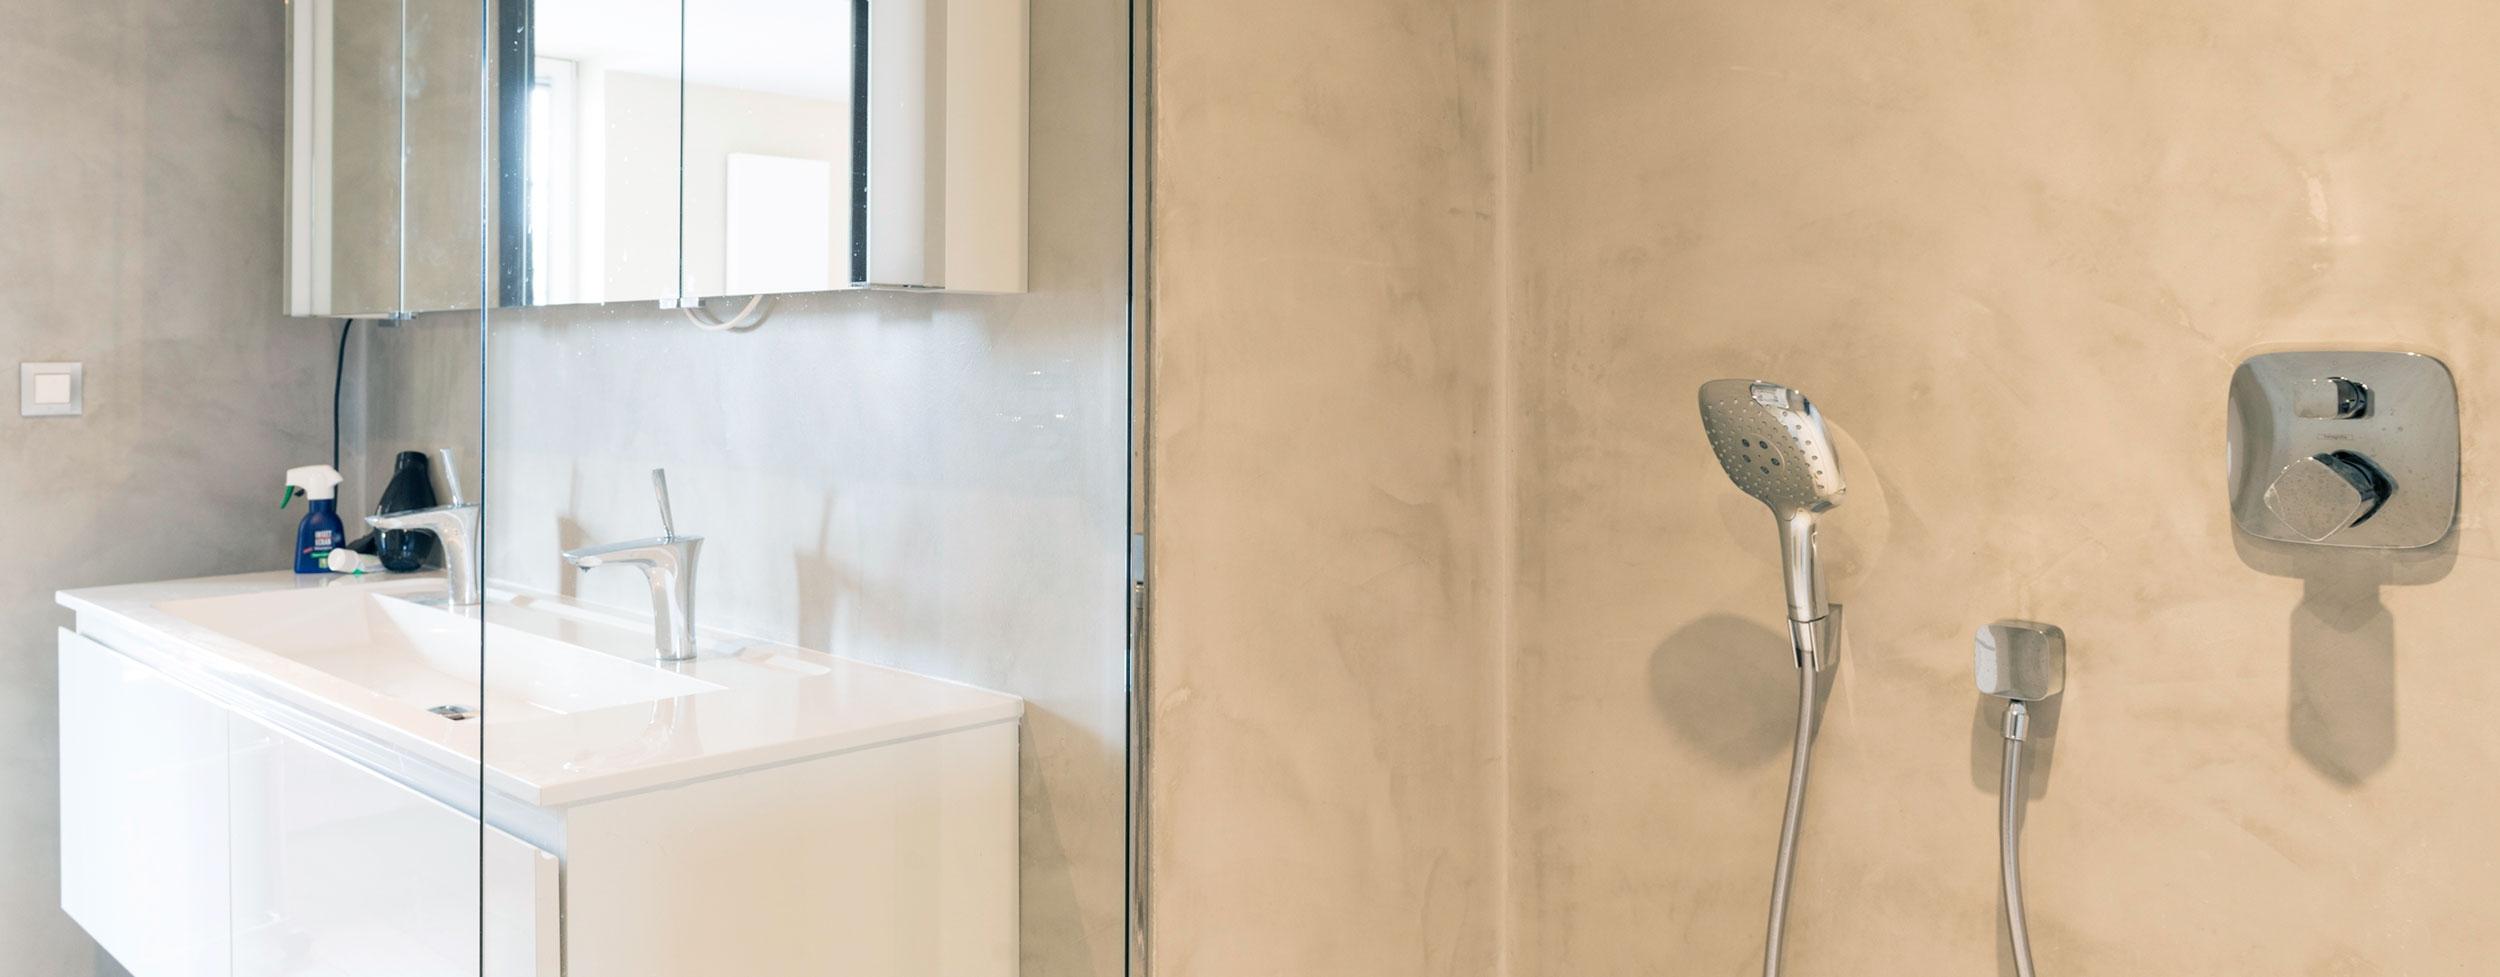 plomberie-sanitaire-salle-de-bain-appartement-imagetop